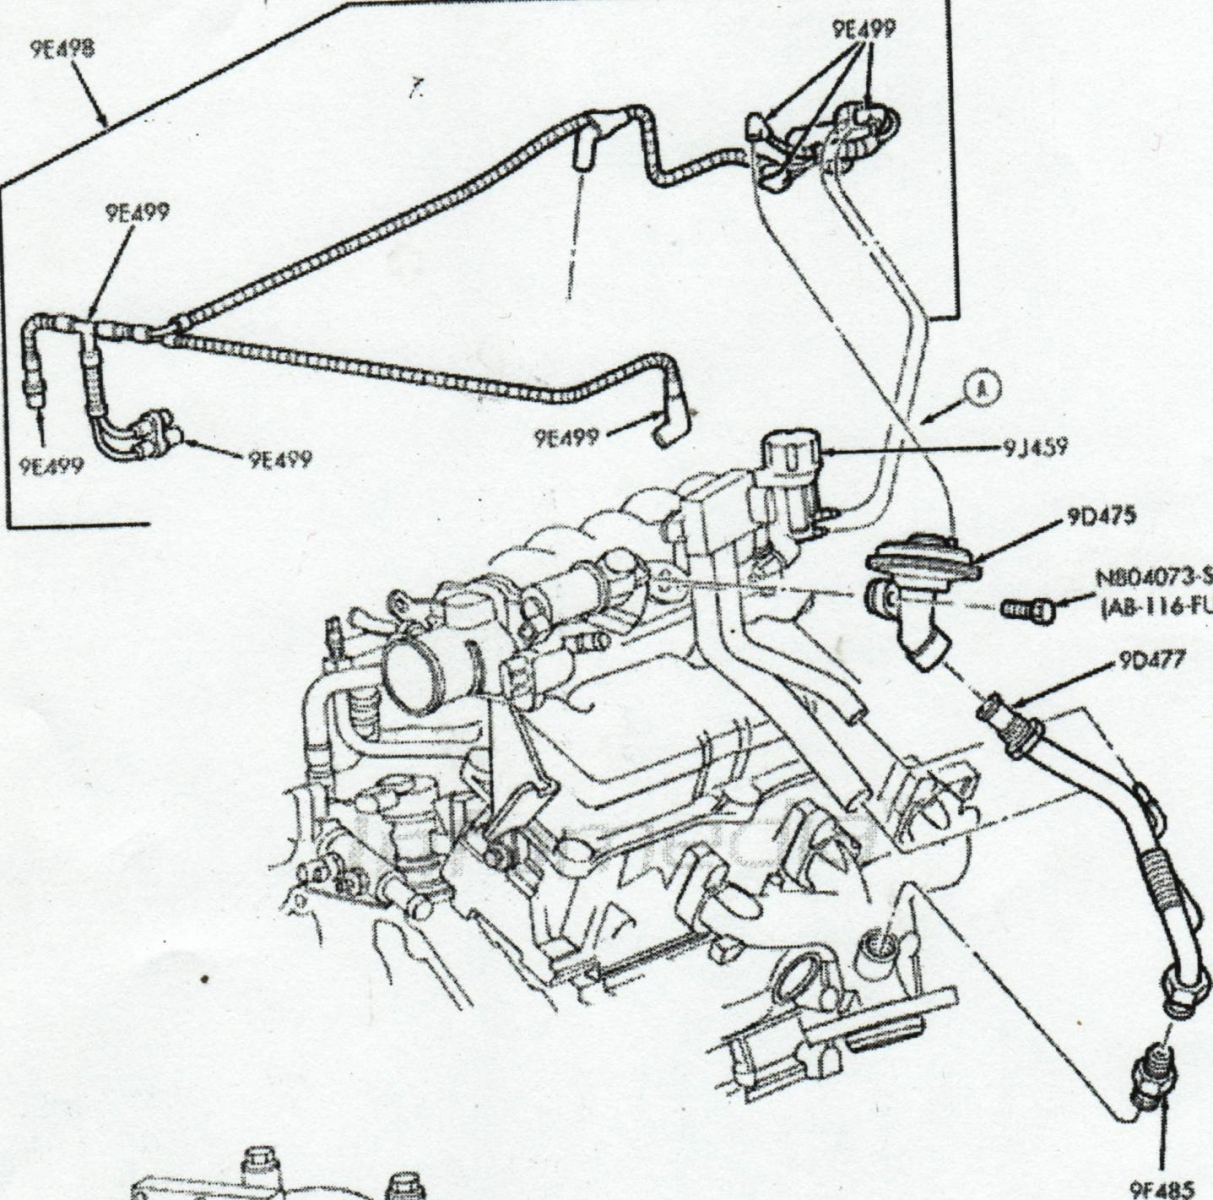 2002 Ford Taurus Wiring Diagram